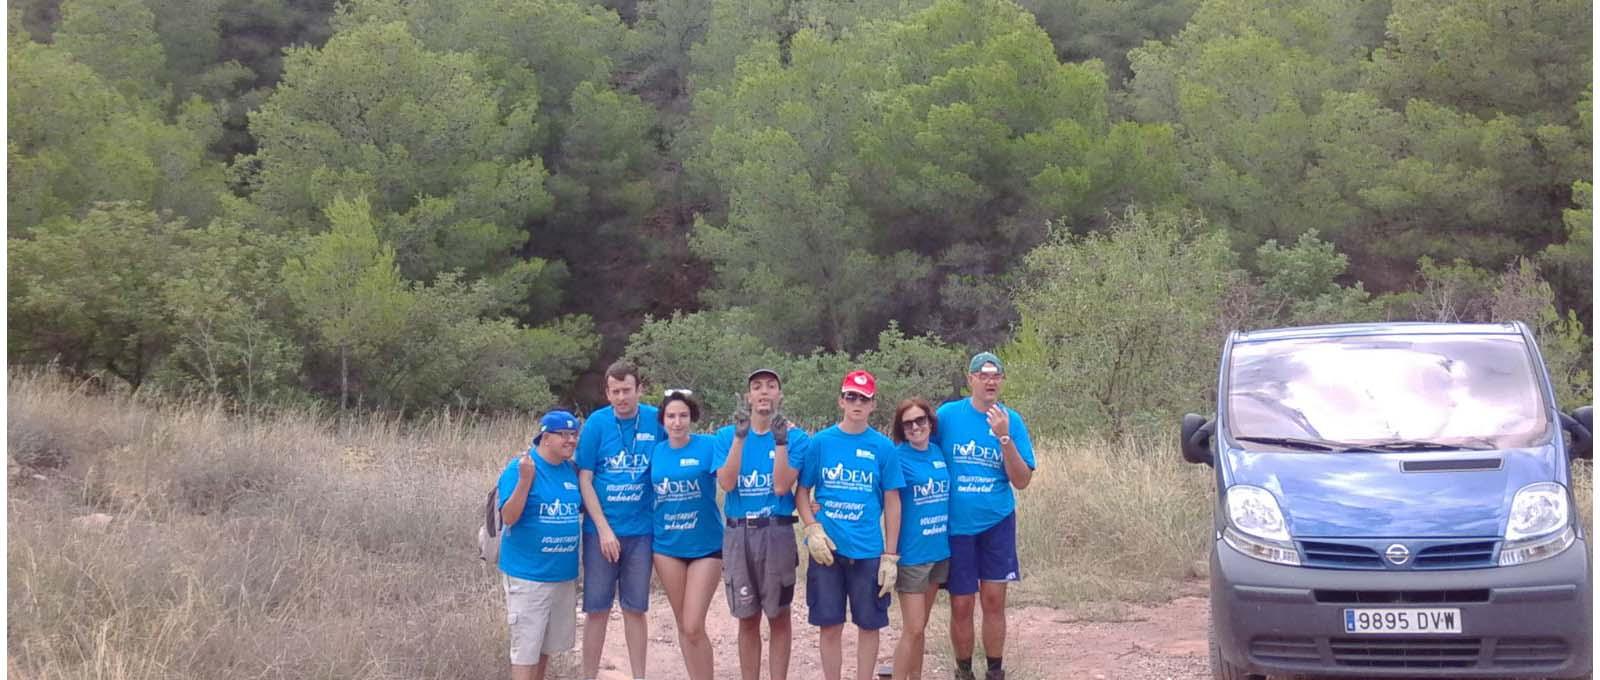 VOLUNTARIAT AMBIENTAL EN PREVENCIÓ D´INCENDIS FORESTALS EN LA SERRA CALDERONA Y CAMP DE TURIA